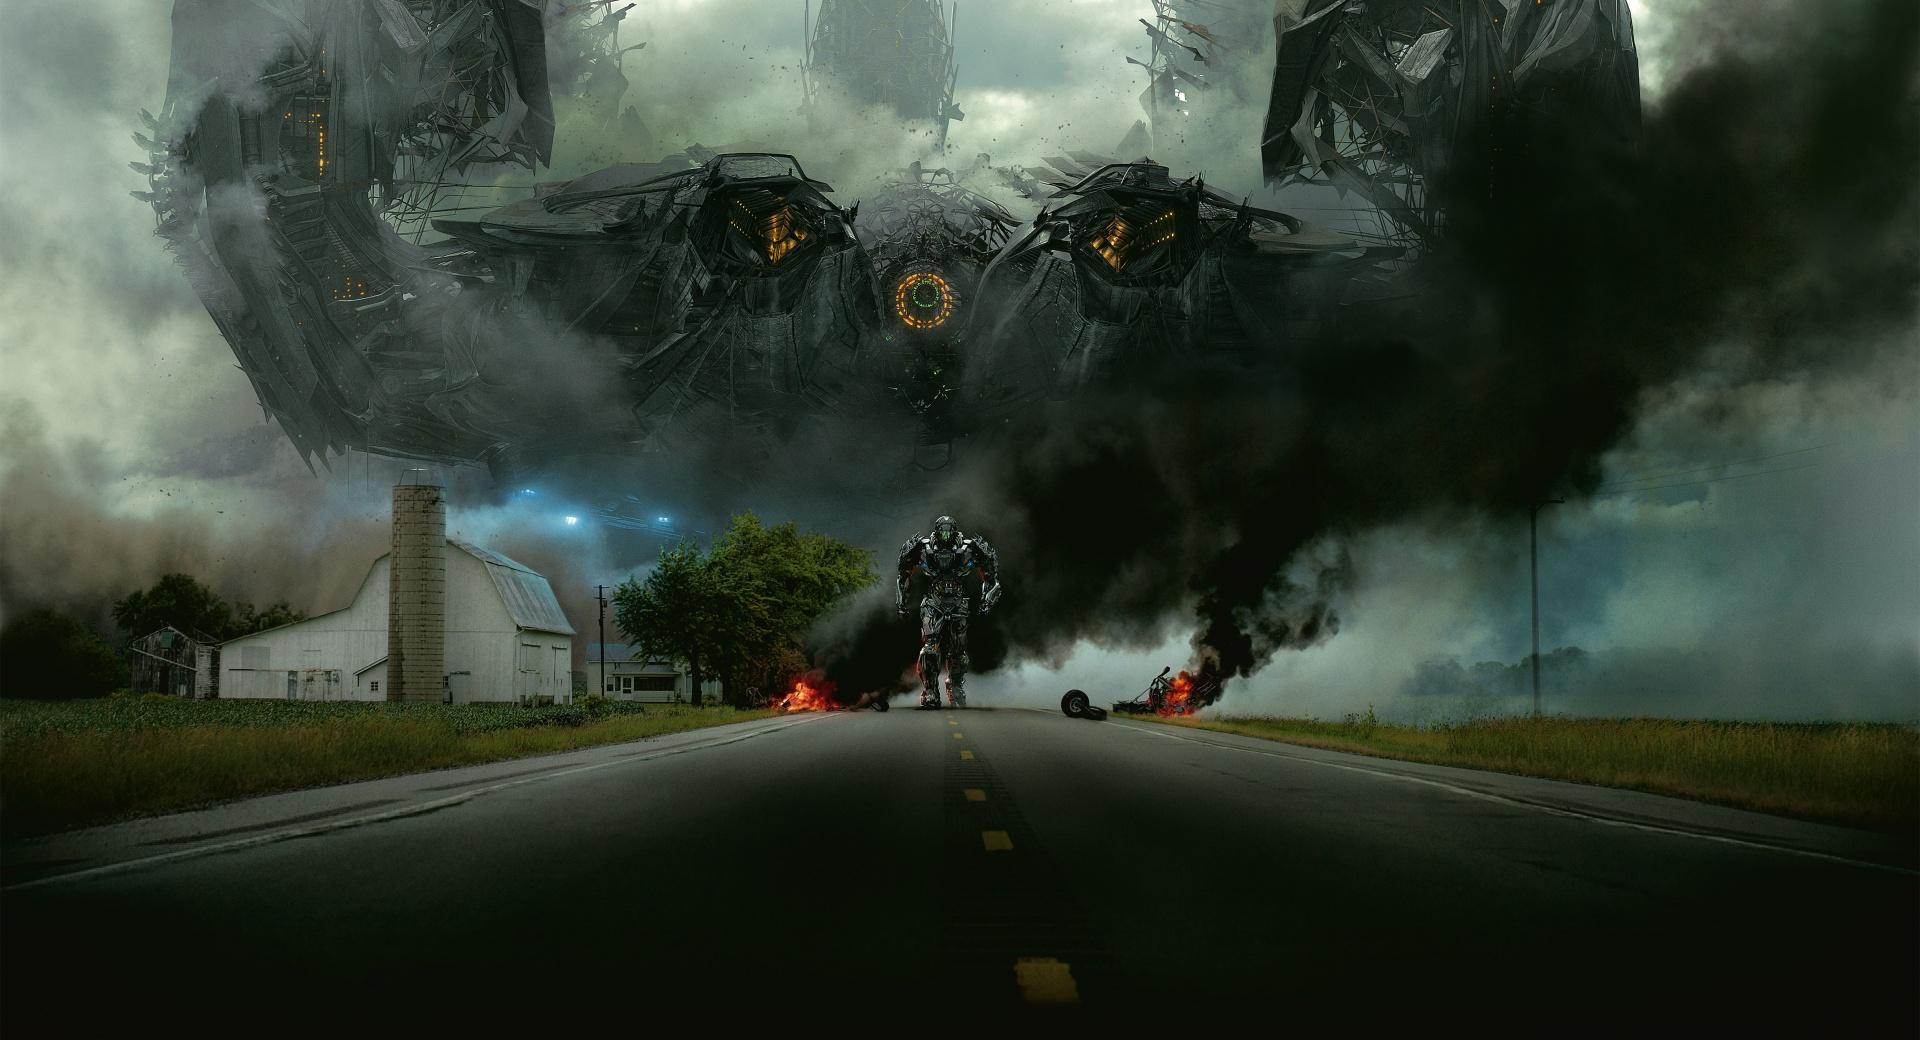 Transformers 4 Lockdown wallpapers HD quality